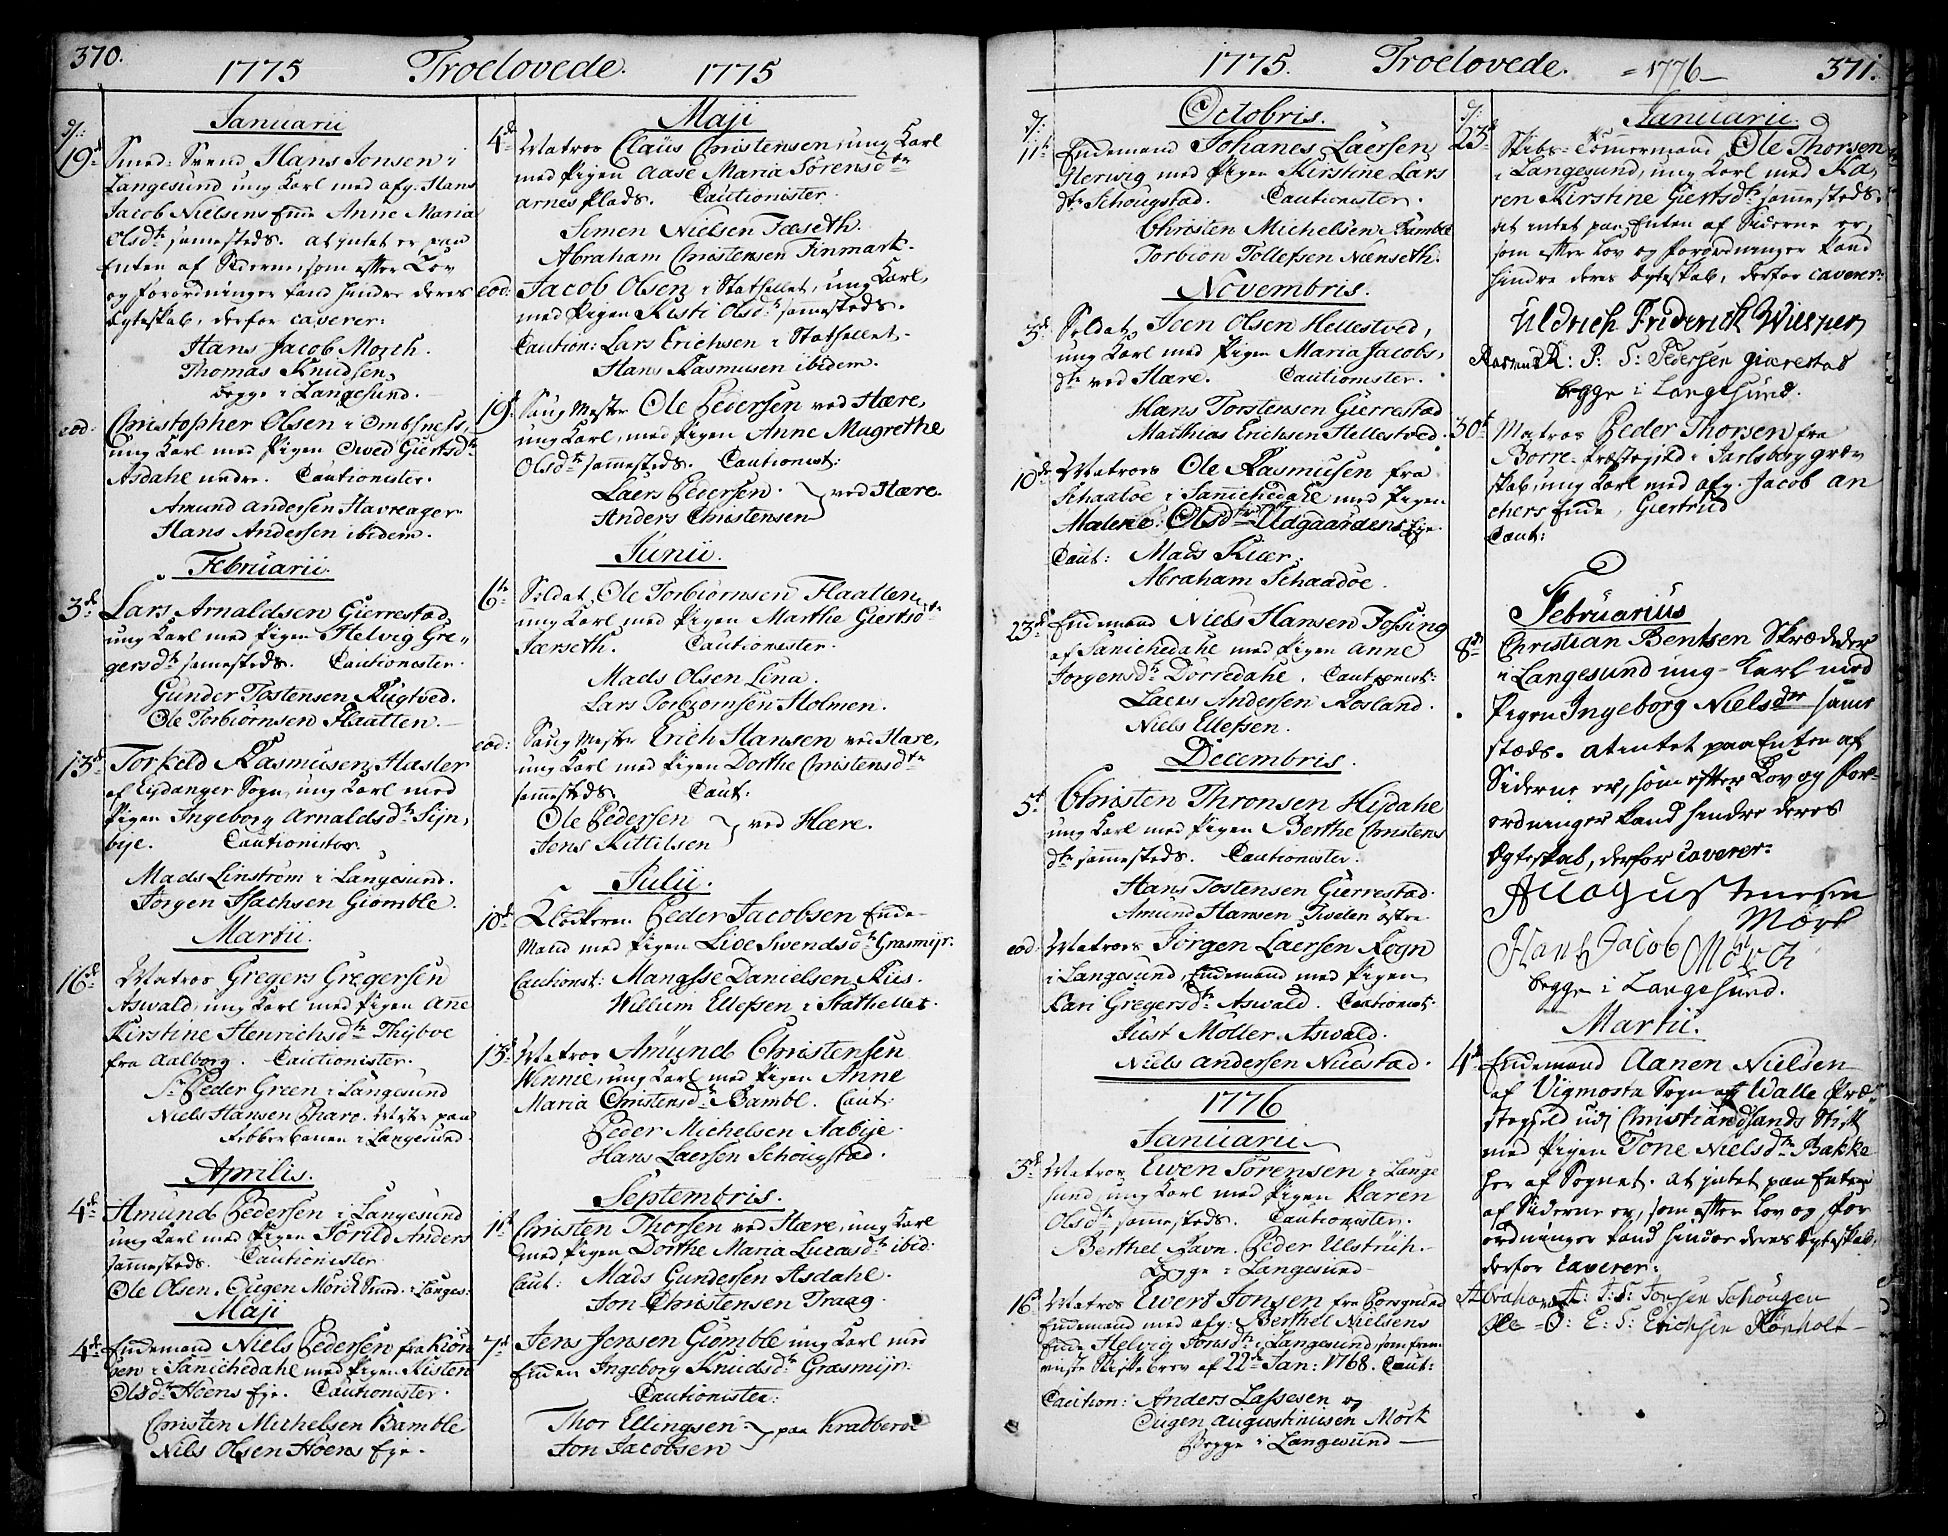 SAKO, Bamble kirkebøker, F/Fa/L0002: Ministerialbok nr. I 2, 1775-1814, s. 370-371